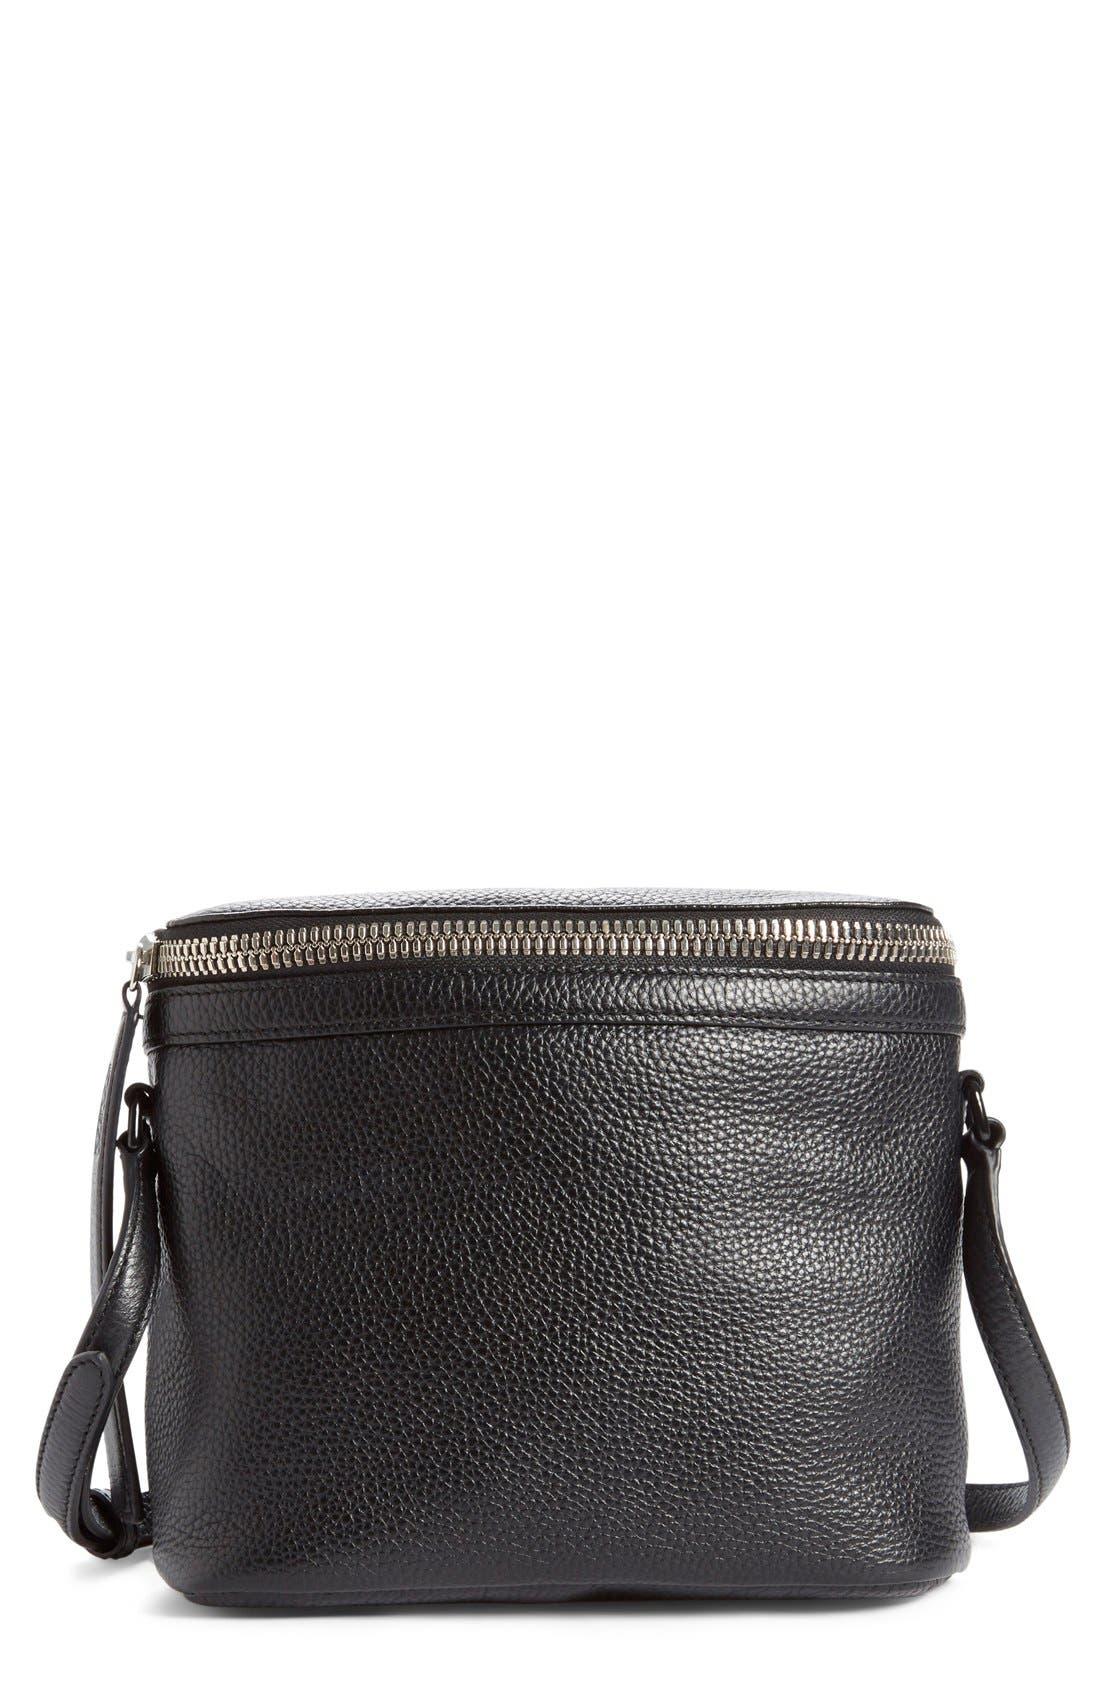 Main Image - KARA Large Stowaway Leather Crossbody Bag